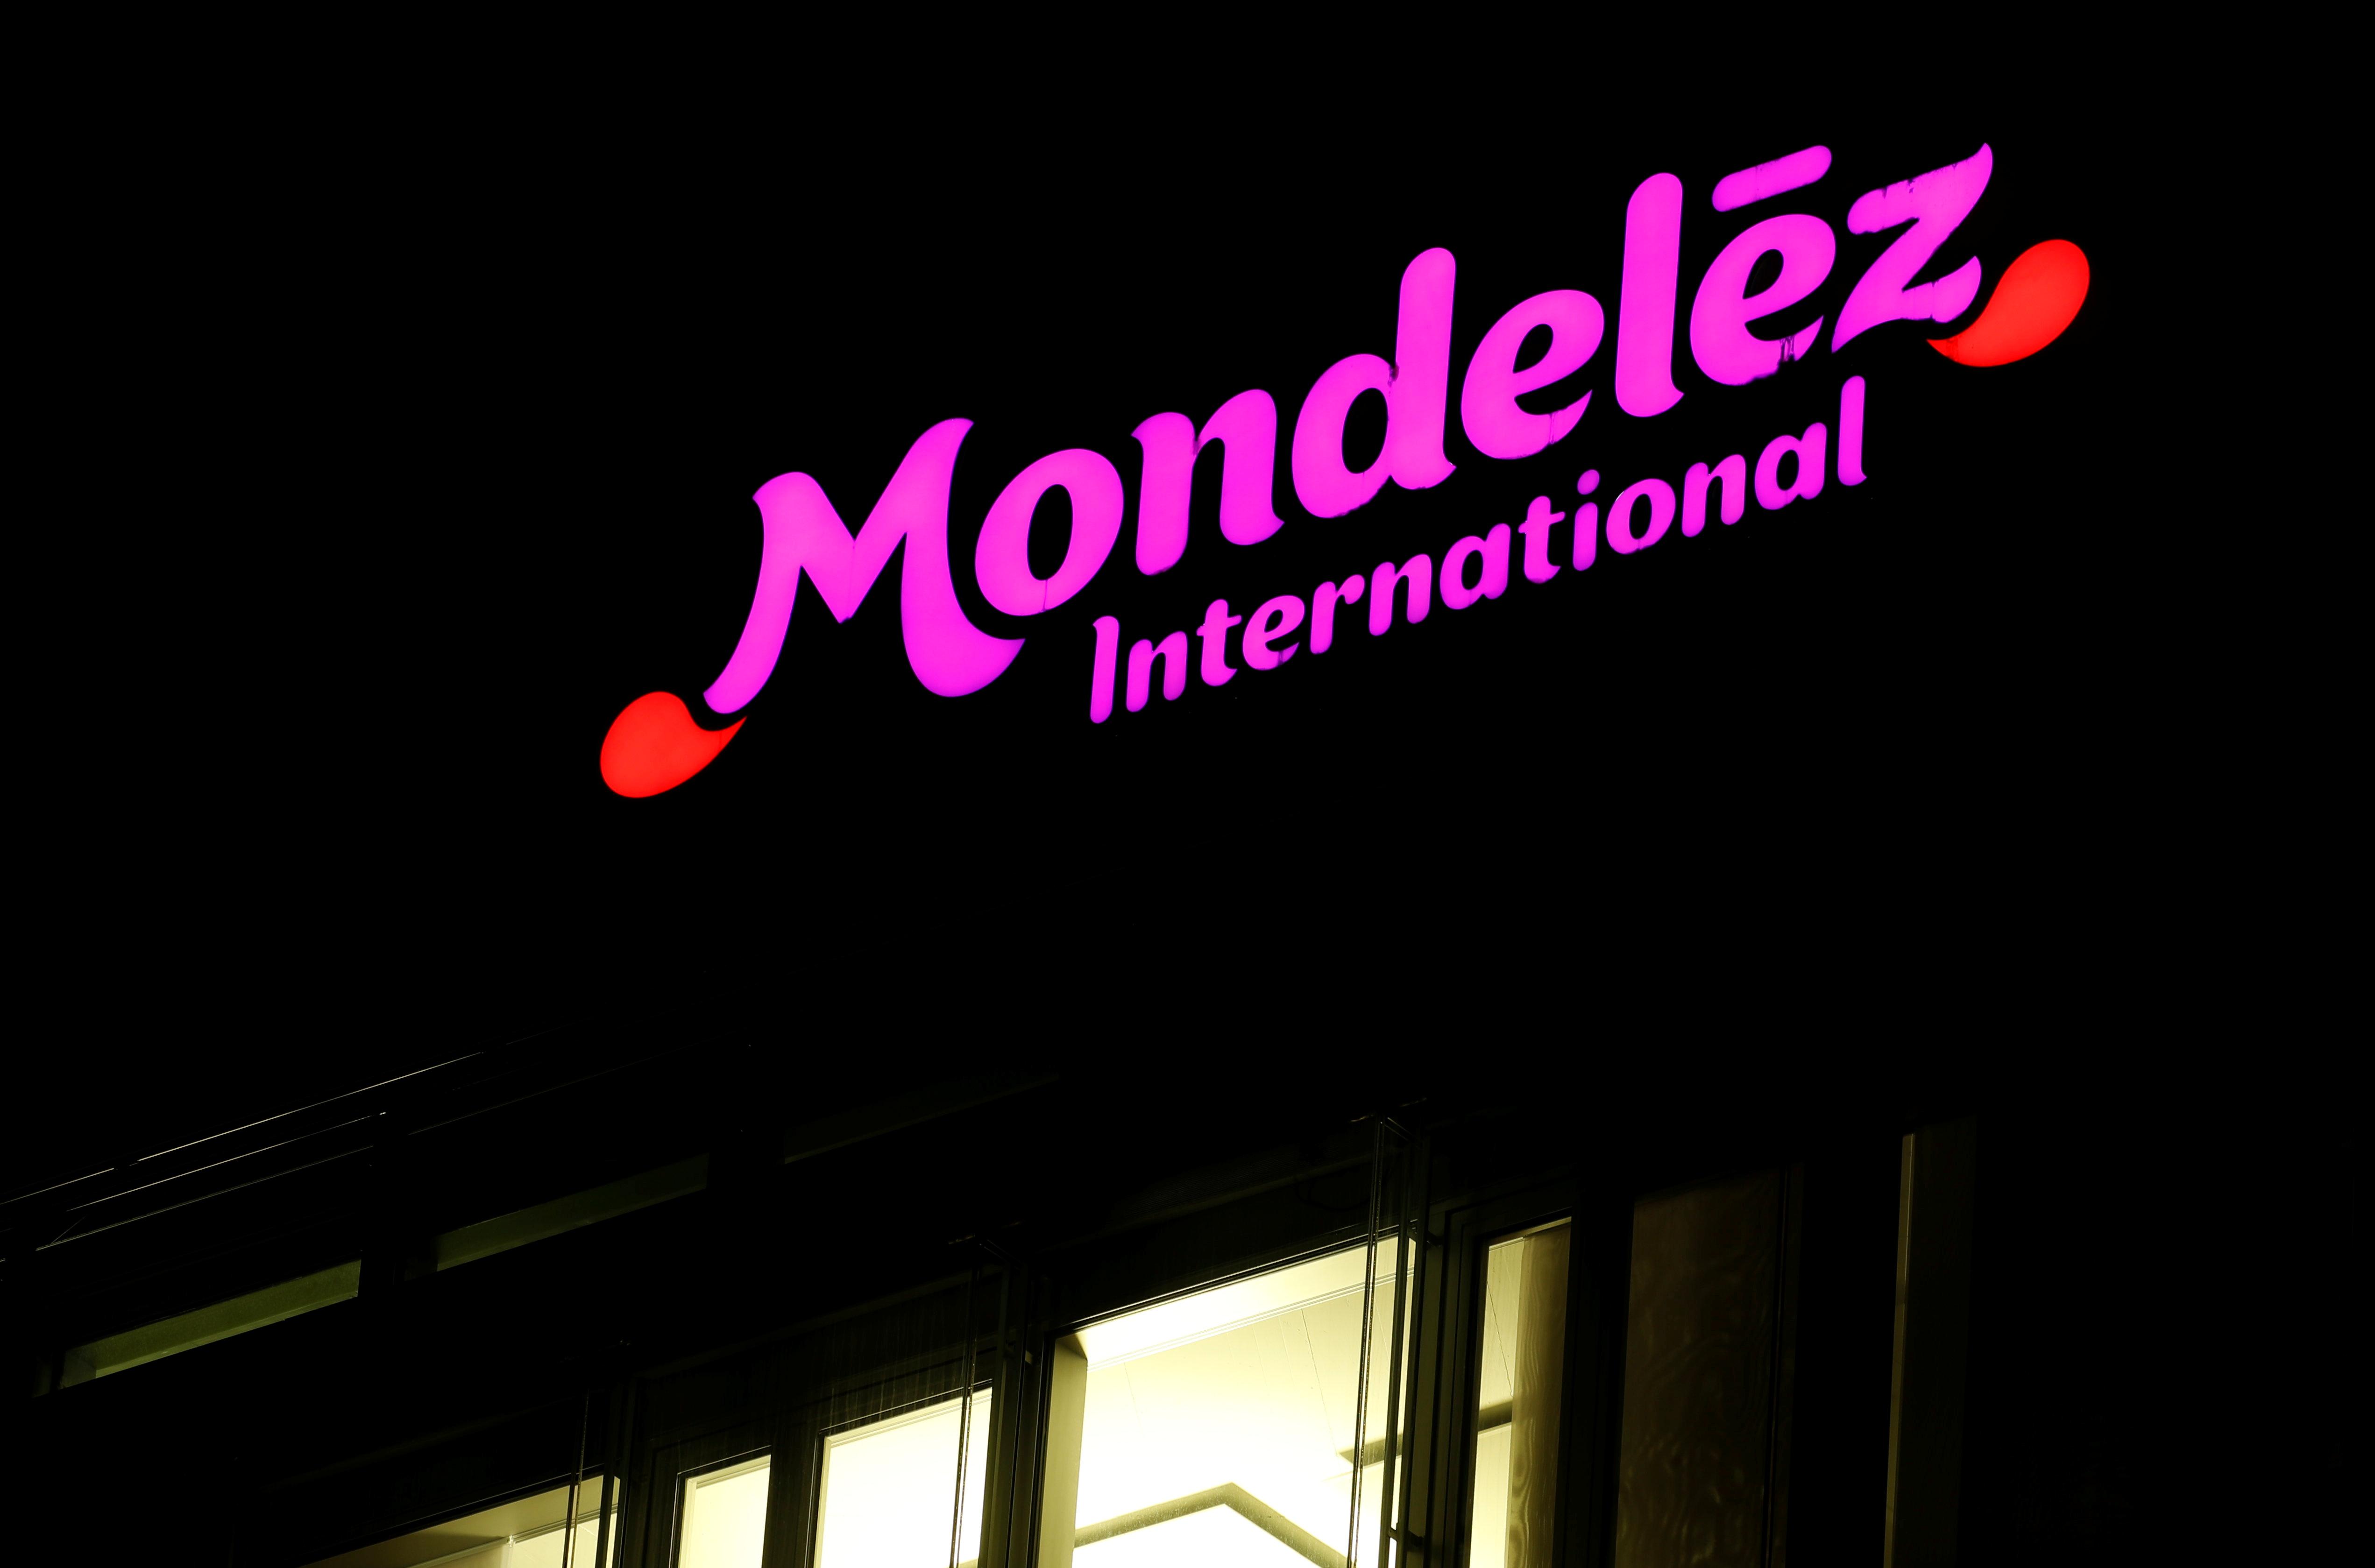 The logo of Mondelez International on an office building in the Glattpark district in Opfikon, Switzerland October 2, 2018.  REUTERS/Arnd Wiegmann